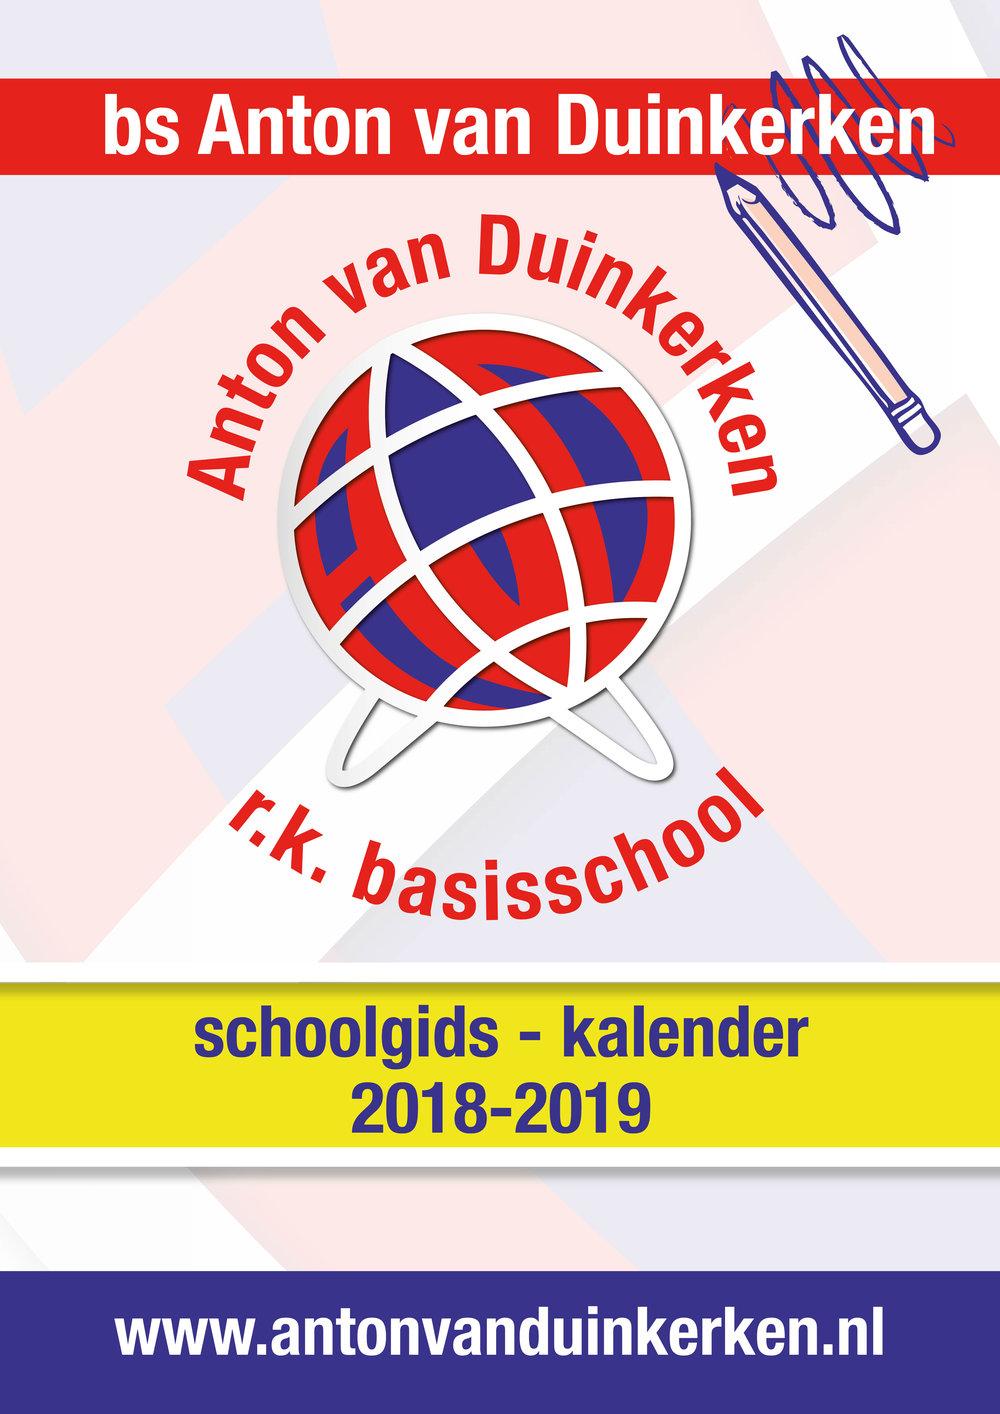 ZandBij_AVD_Schoolgids_kalender1.jpg